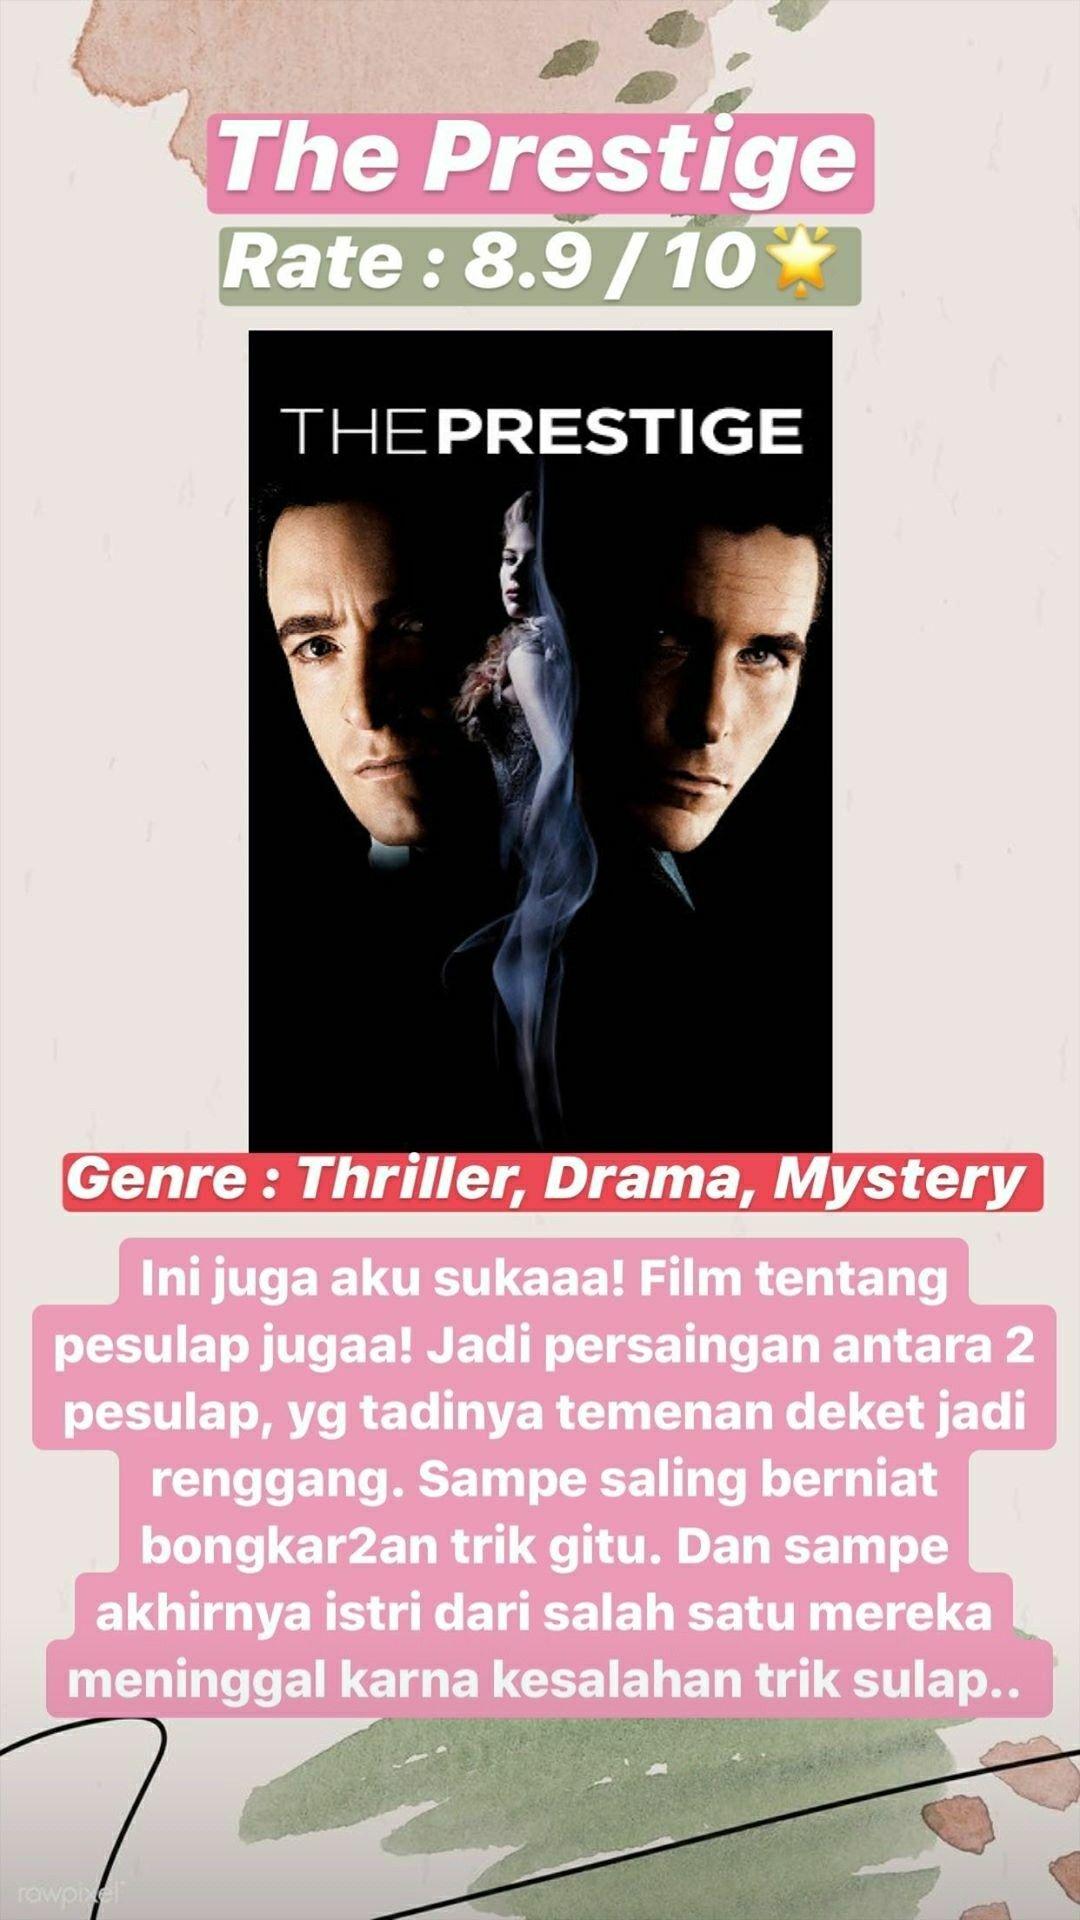 The Prestige Film Rekomendasi Di 2020 The Prestige Film Film Bagus